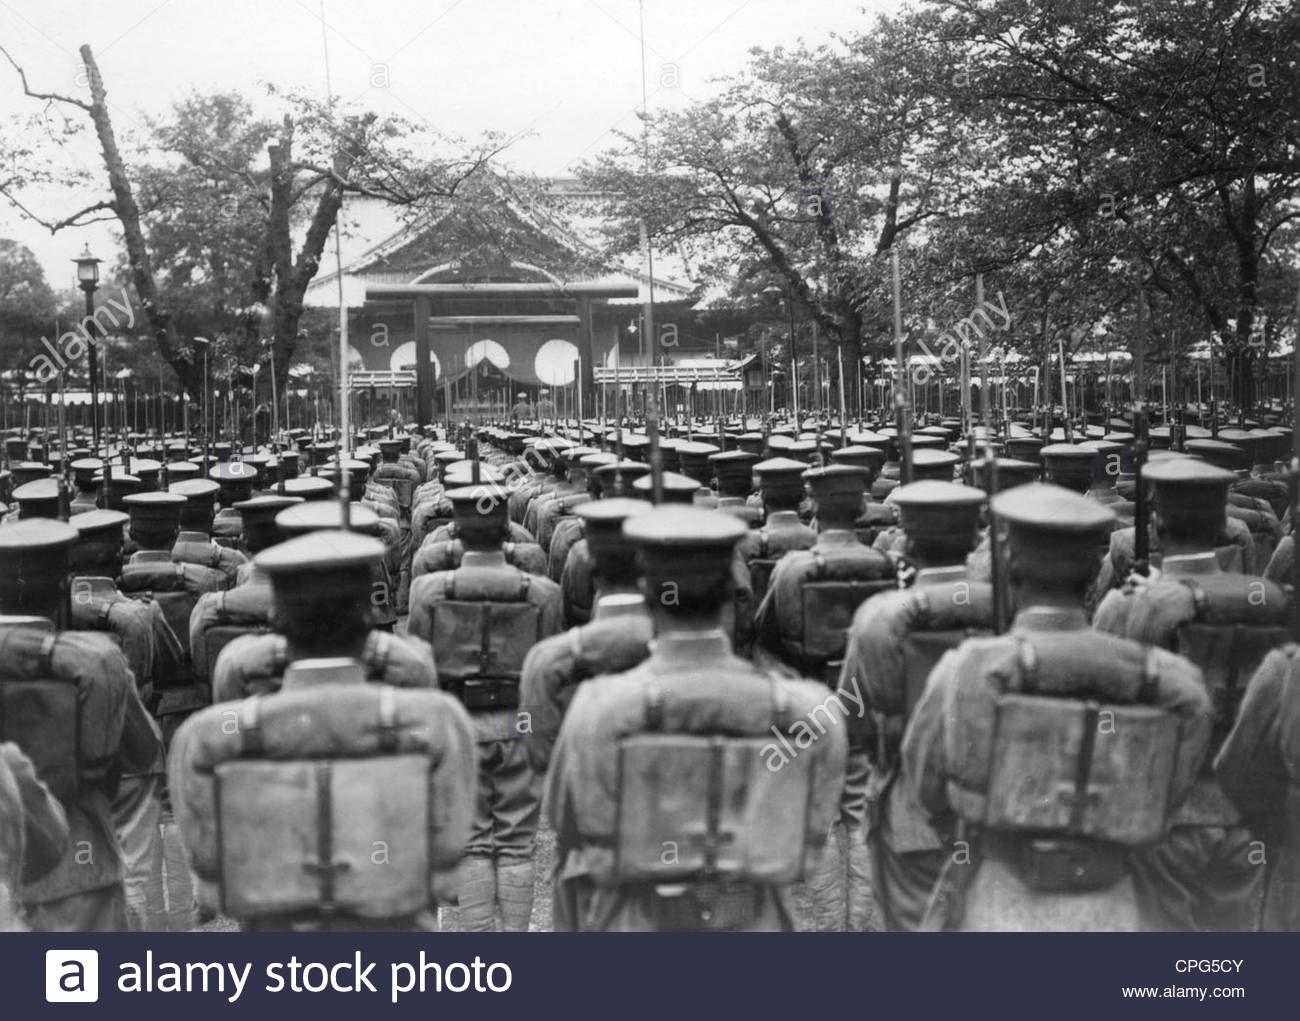 Second Sino Japanese War 1937 1945 Photo Stock Photos Vs The World